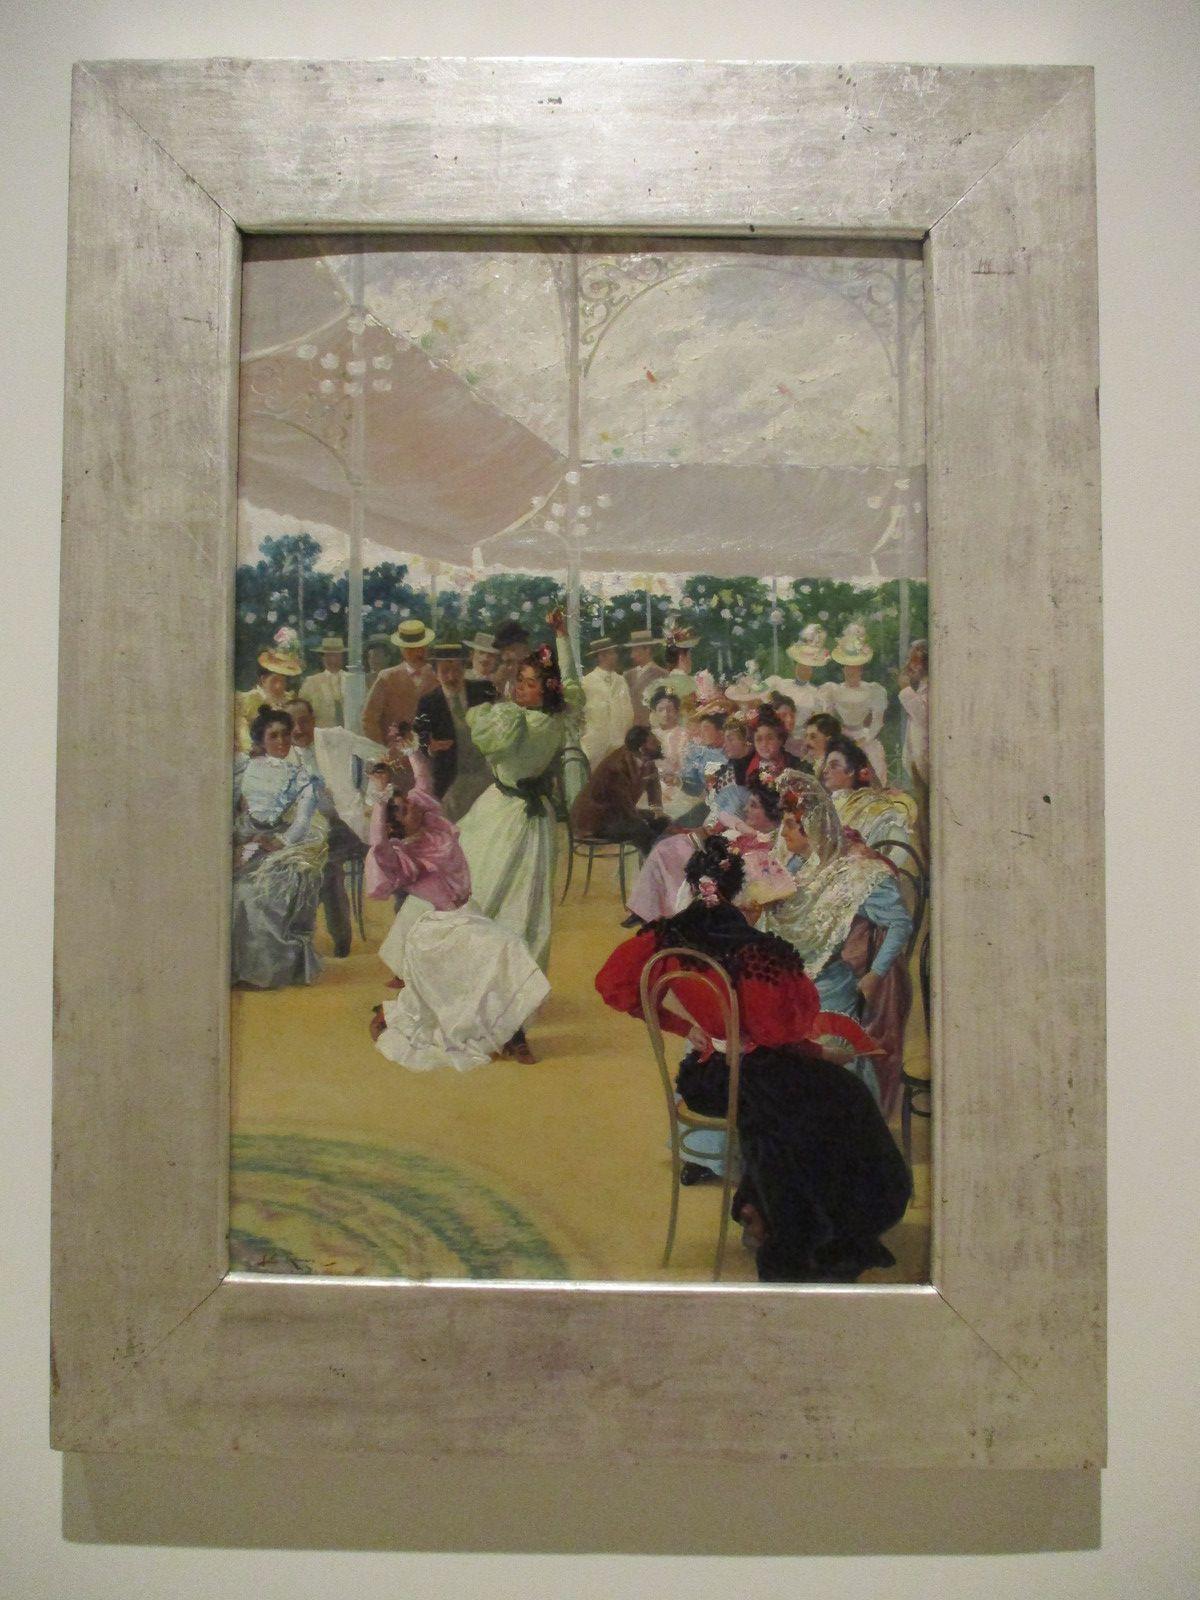 La foire de Cordoue - Julio Romero de Torres, 1900